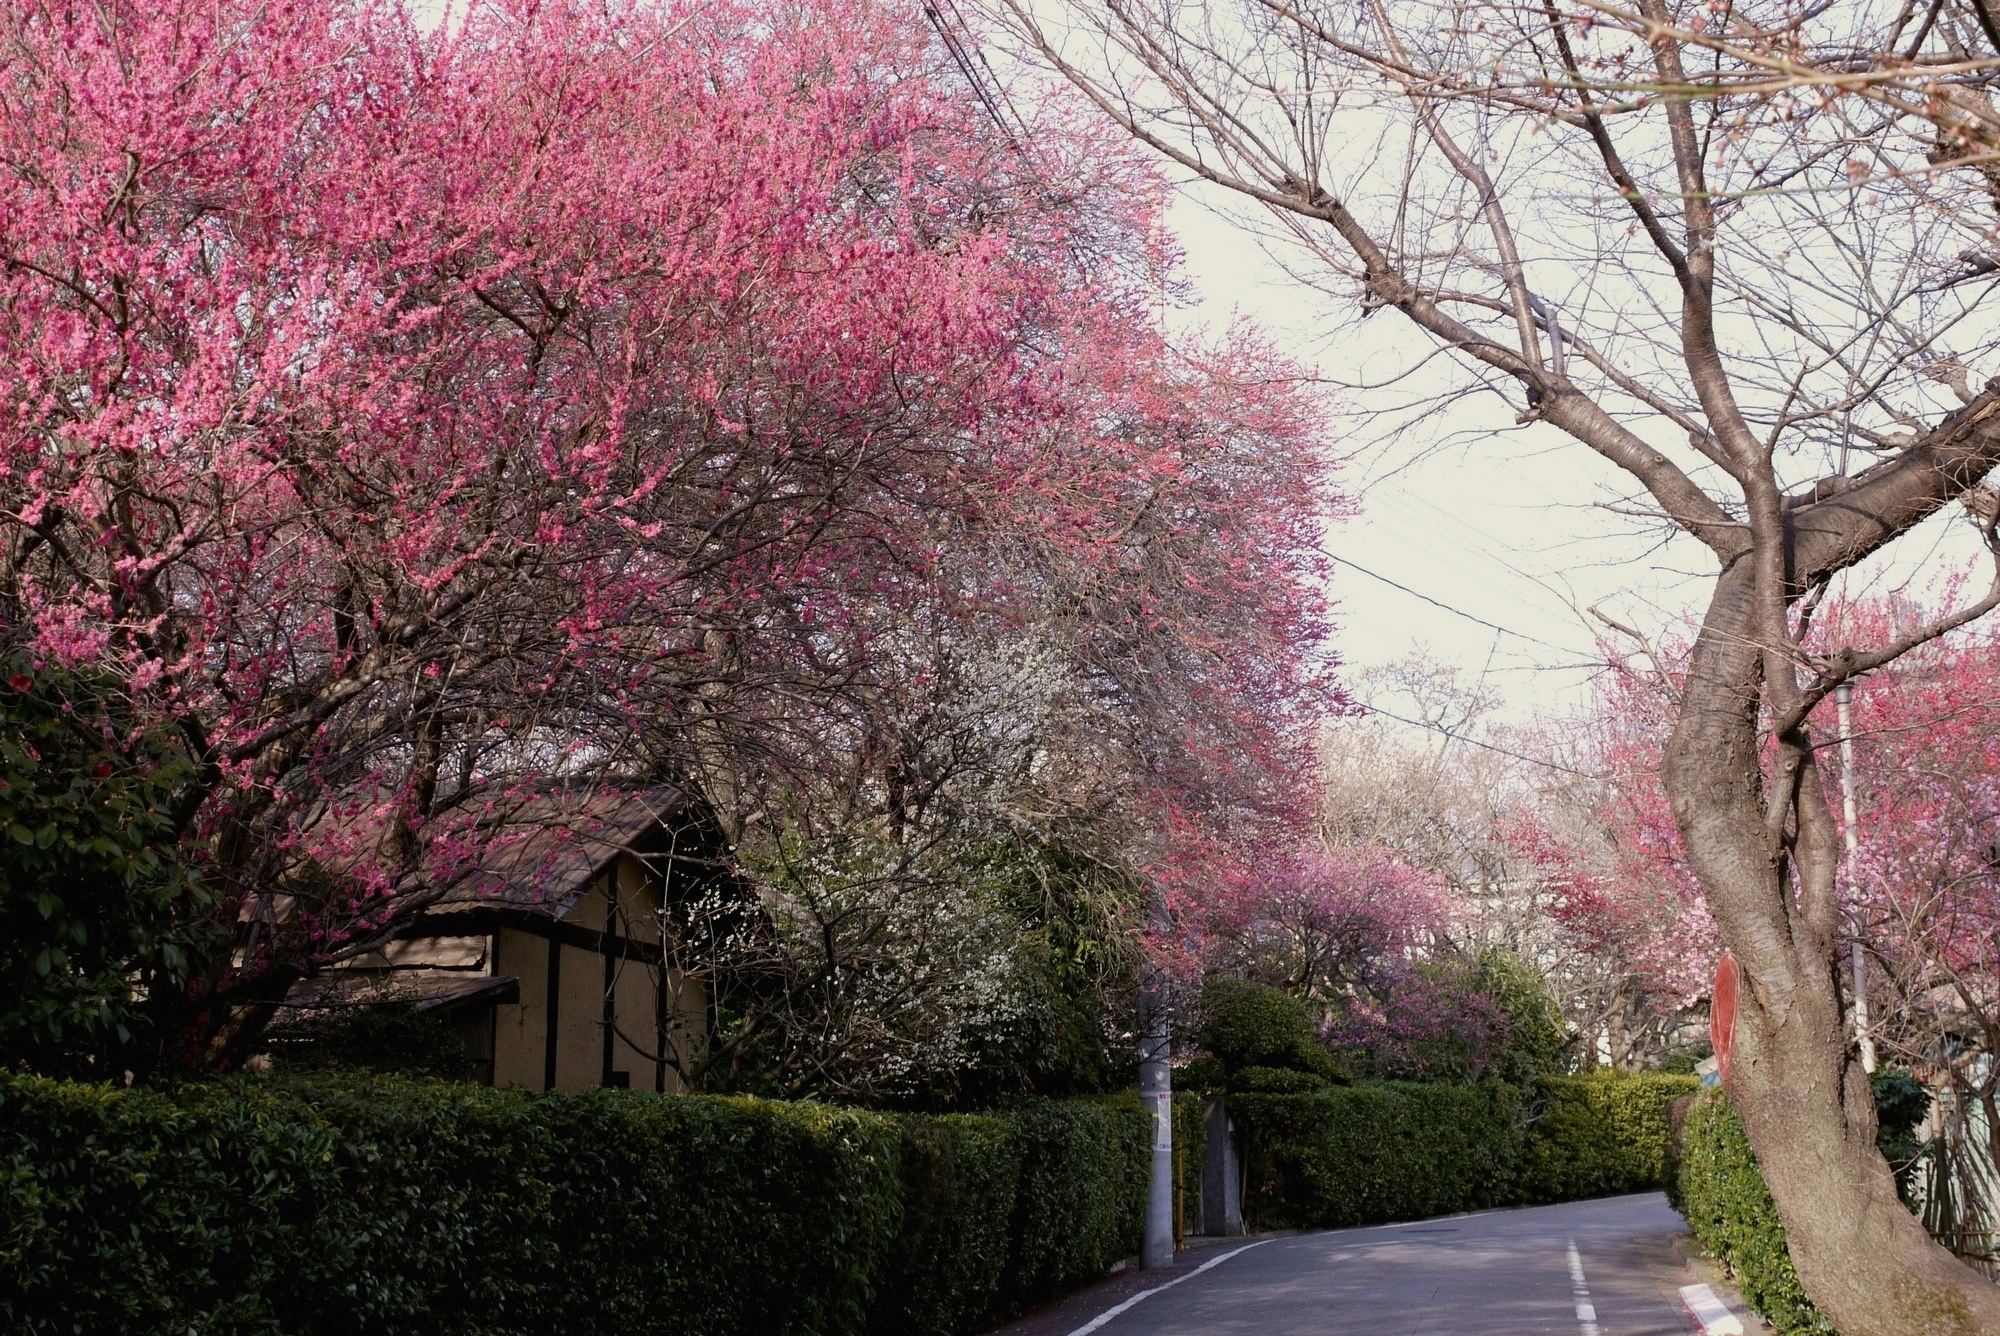 Photography: Takayuki Nakane